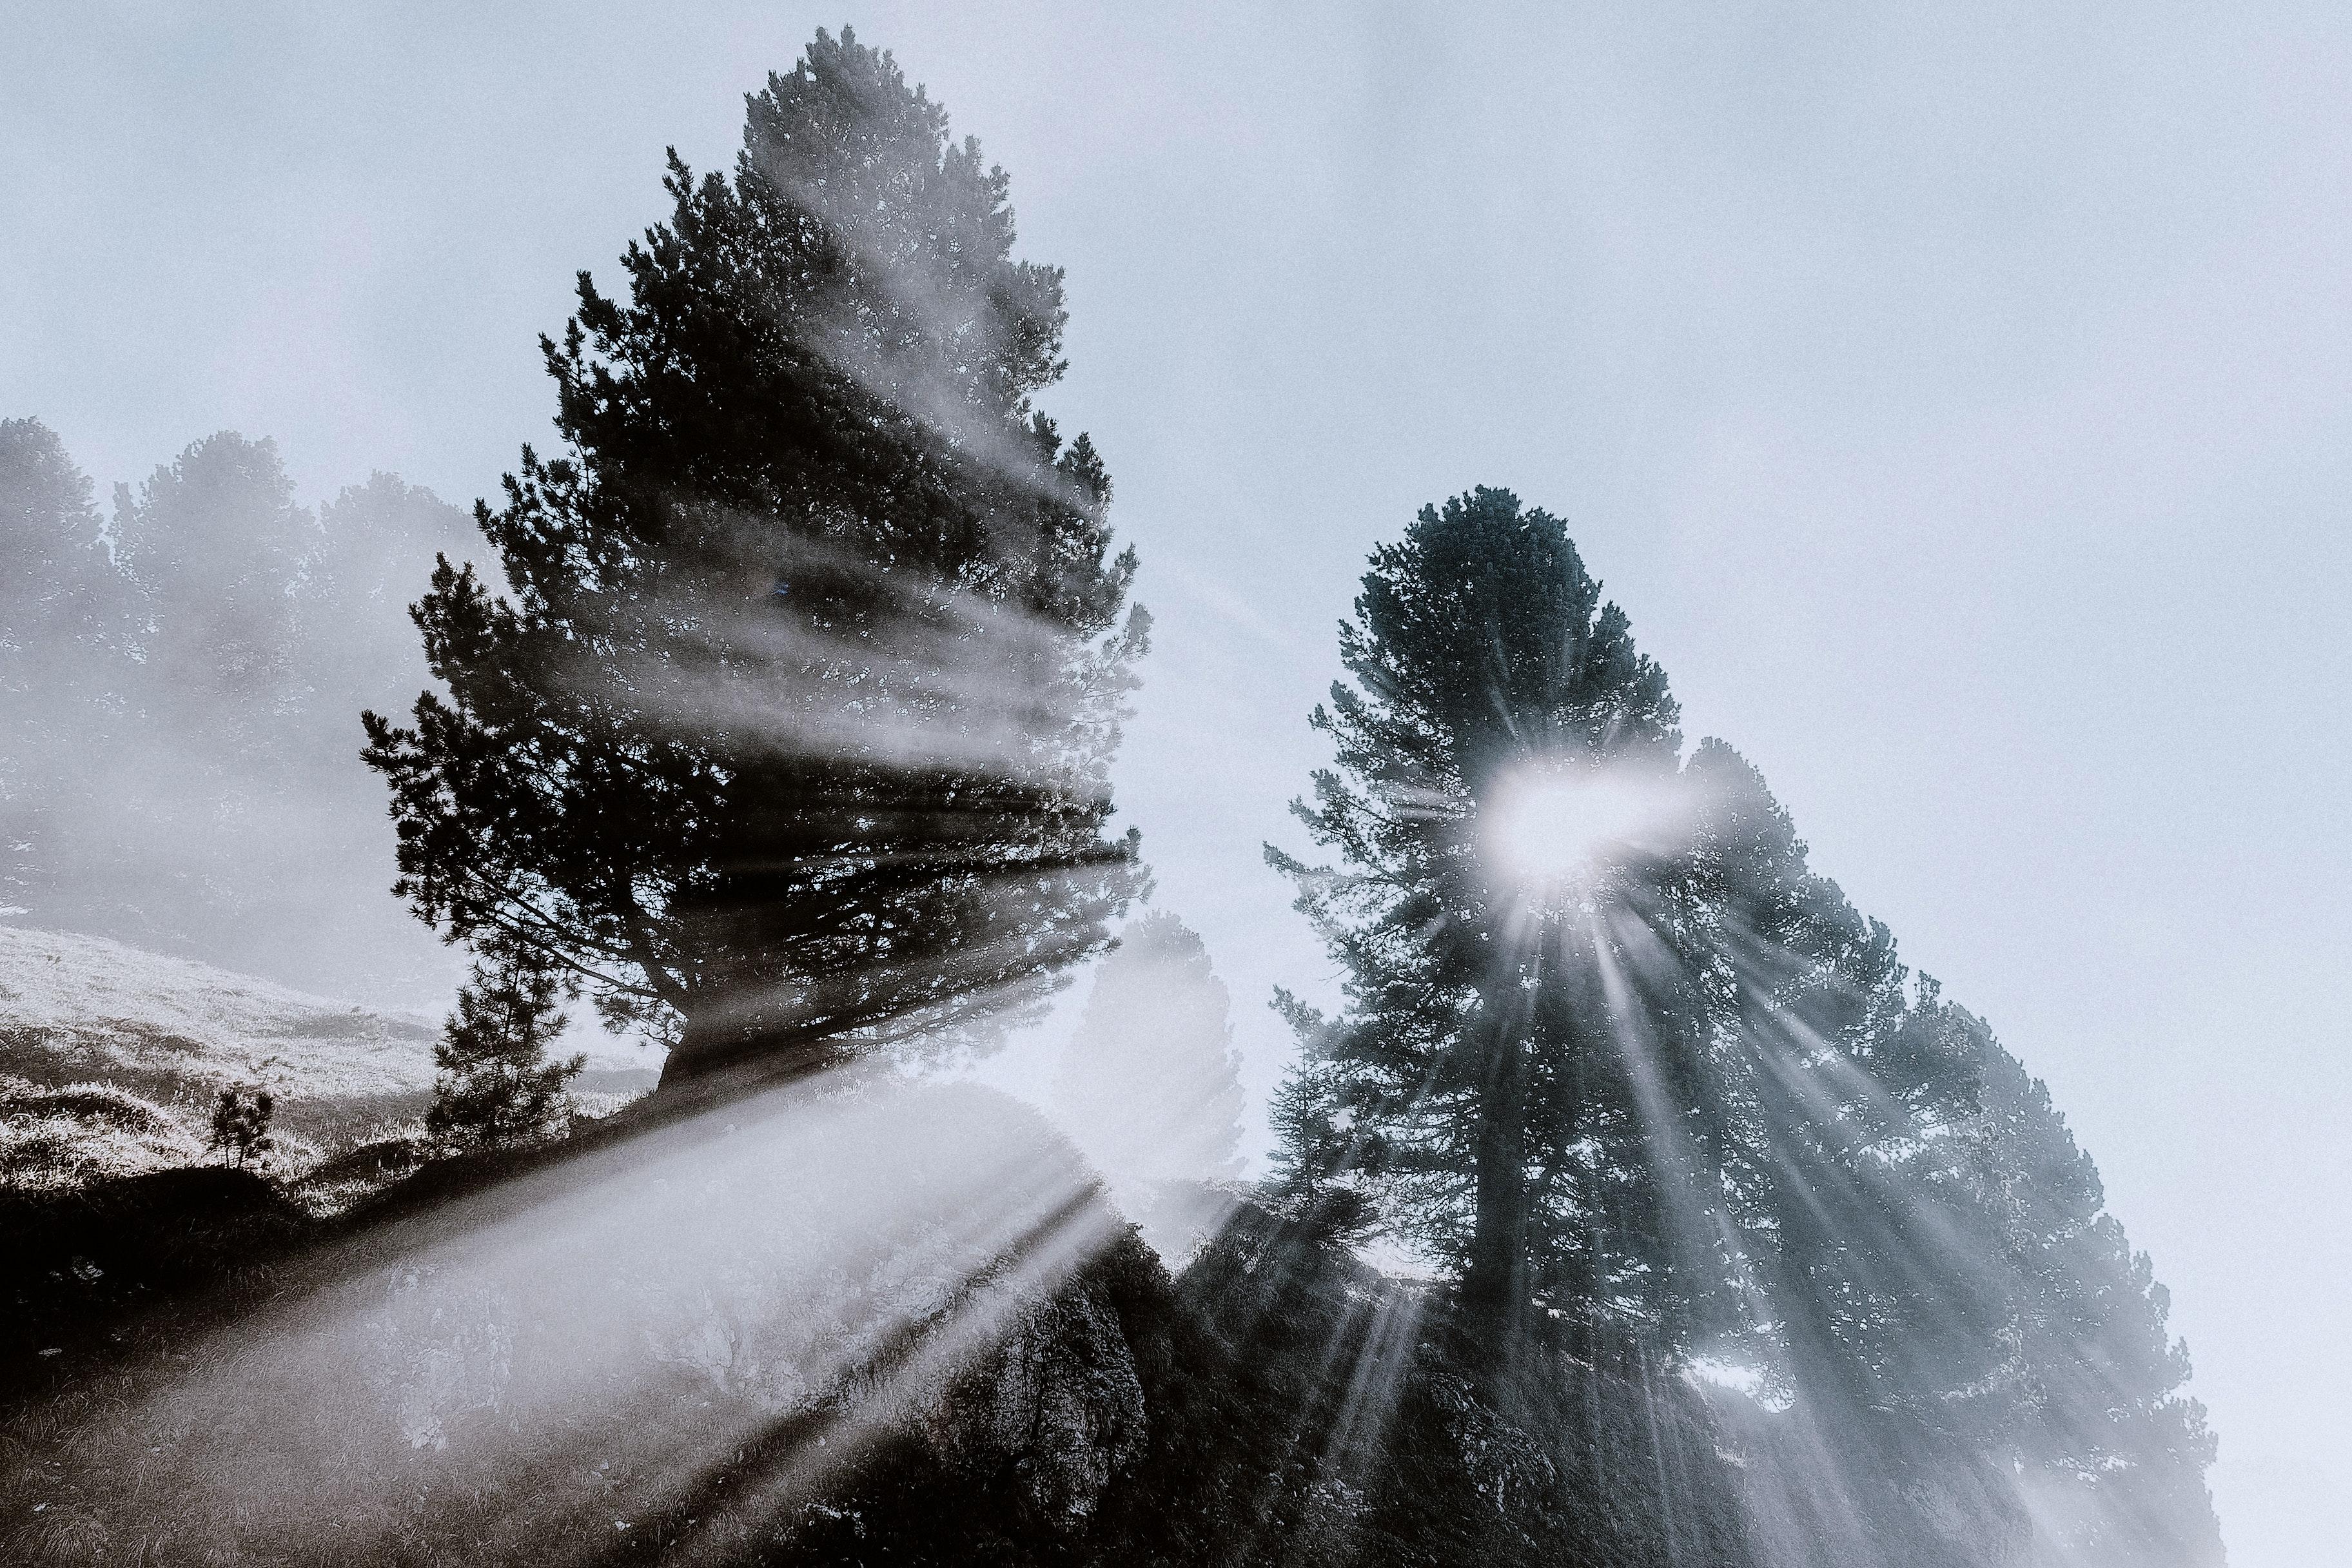 Immagini Belle Sfondi Per Il Desktop Nebbia Hd Wallpaper Mac